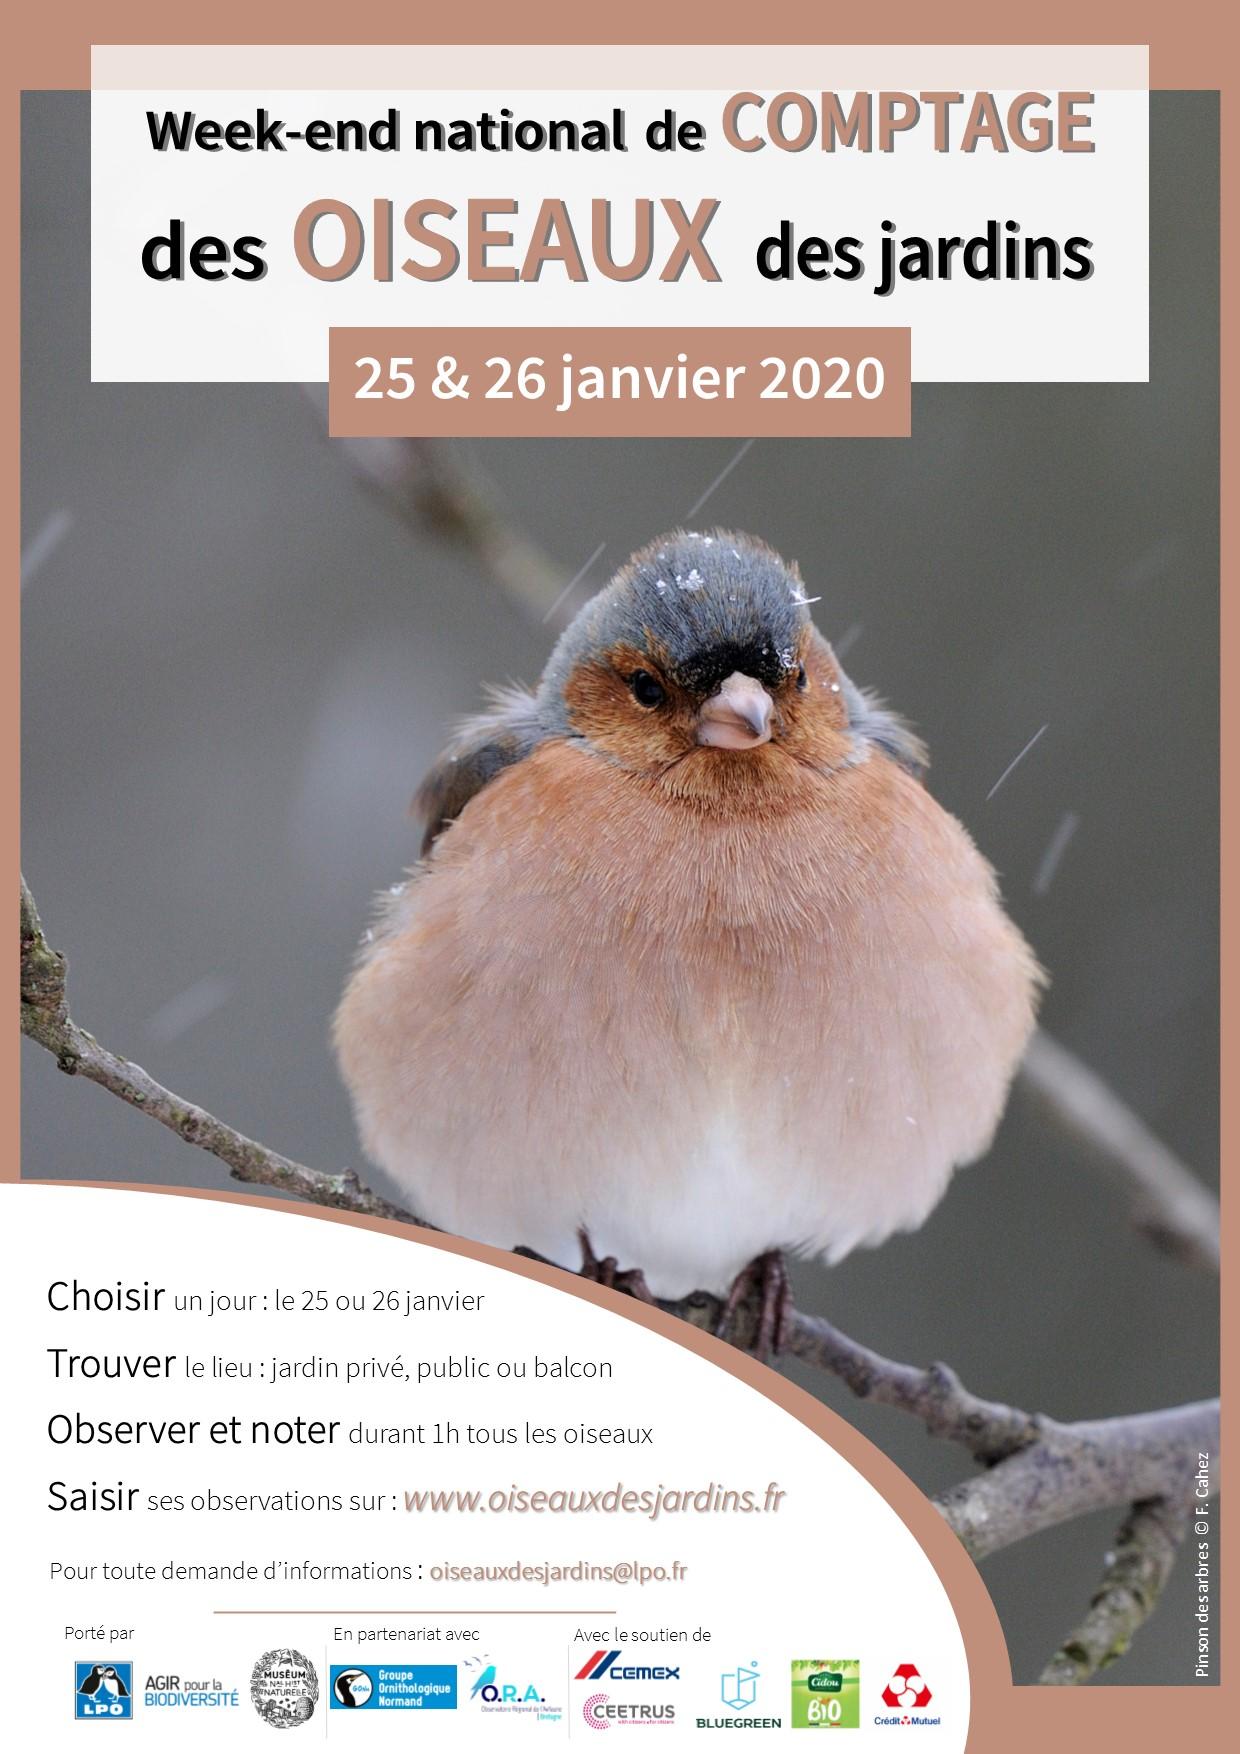 http://files.biolovision.net/www.oiseauxdesjardins.fr/userfiles/Affichecomptagehiver2020aveclogopartenaires.jpg